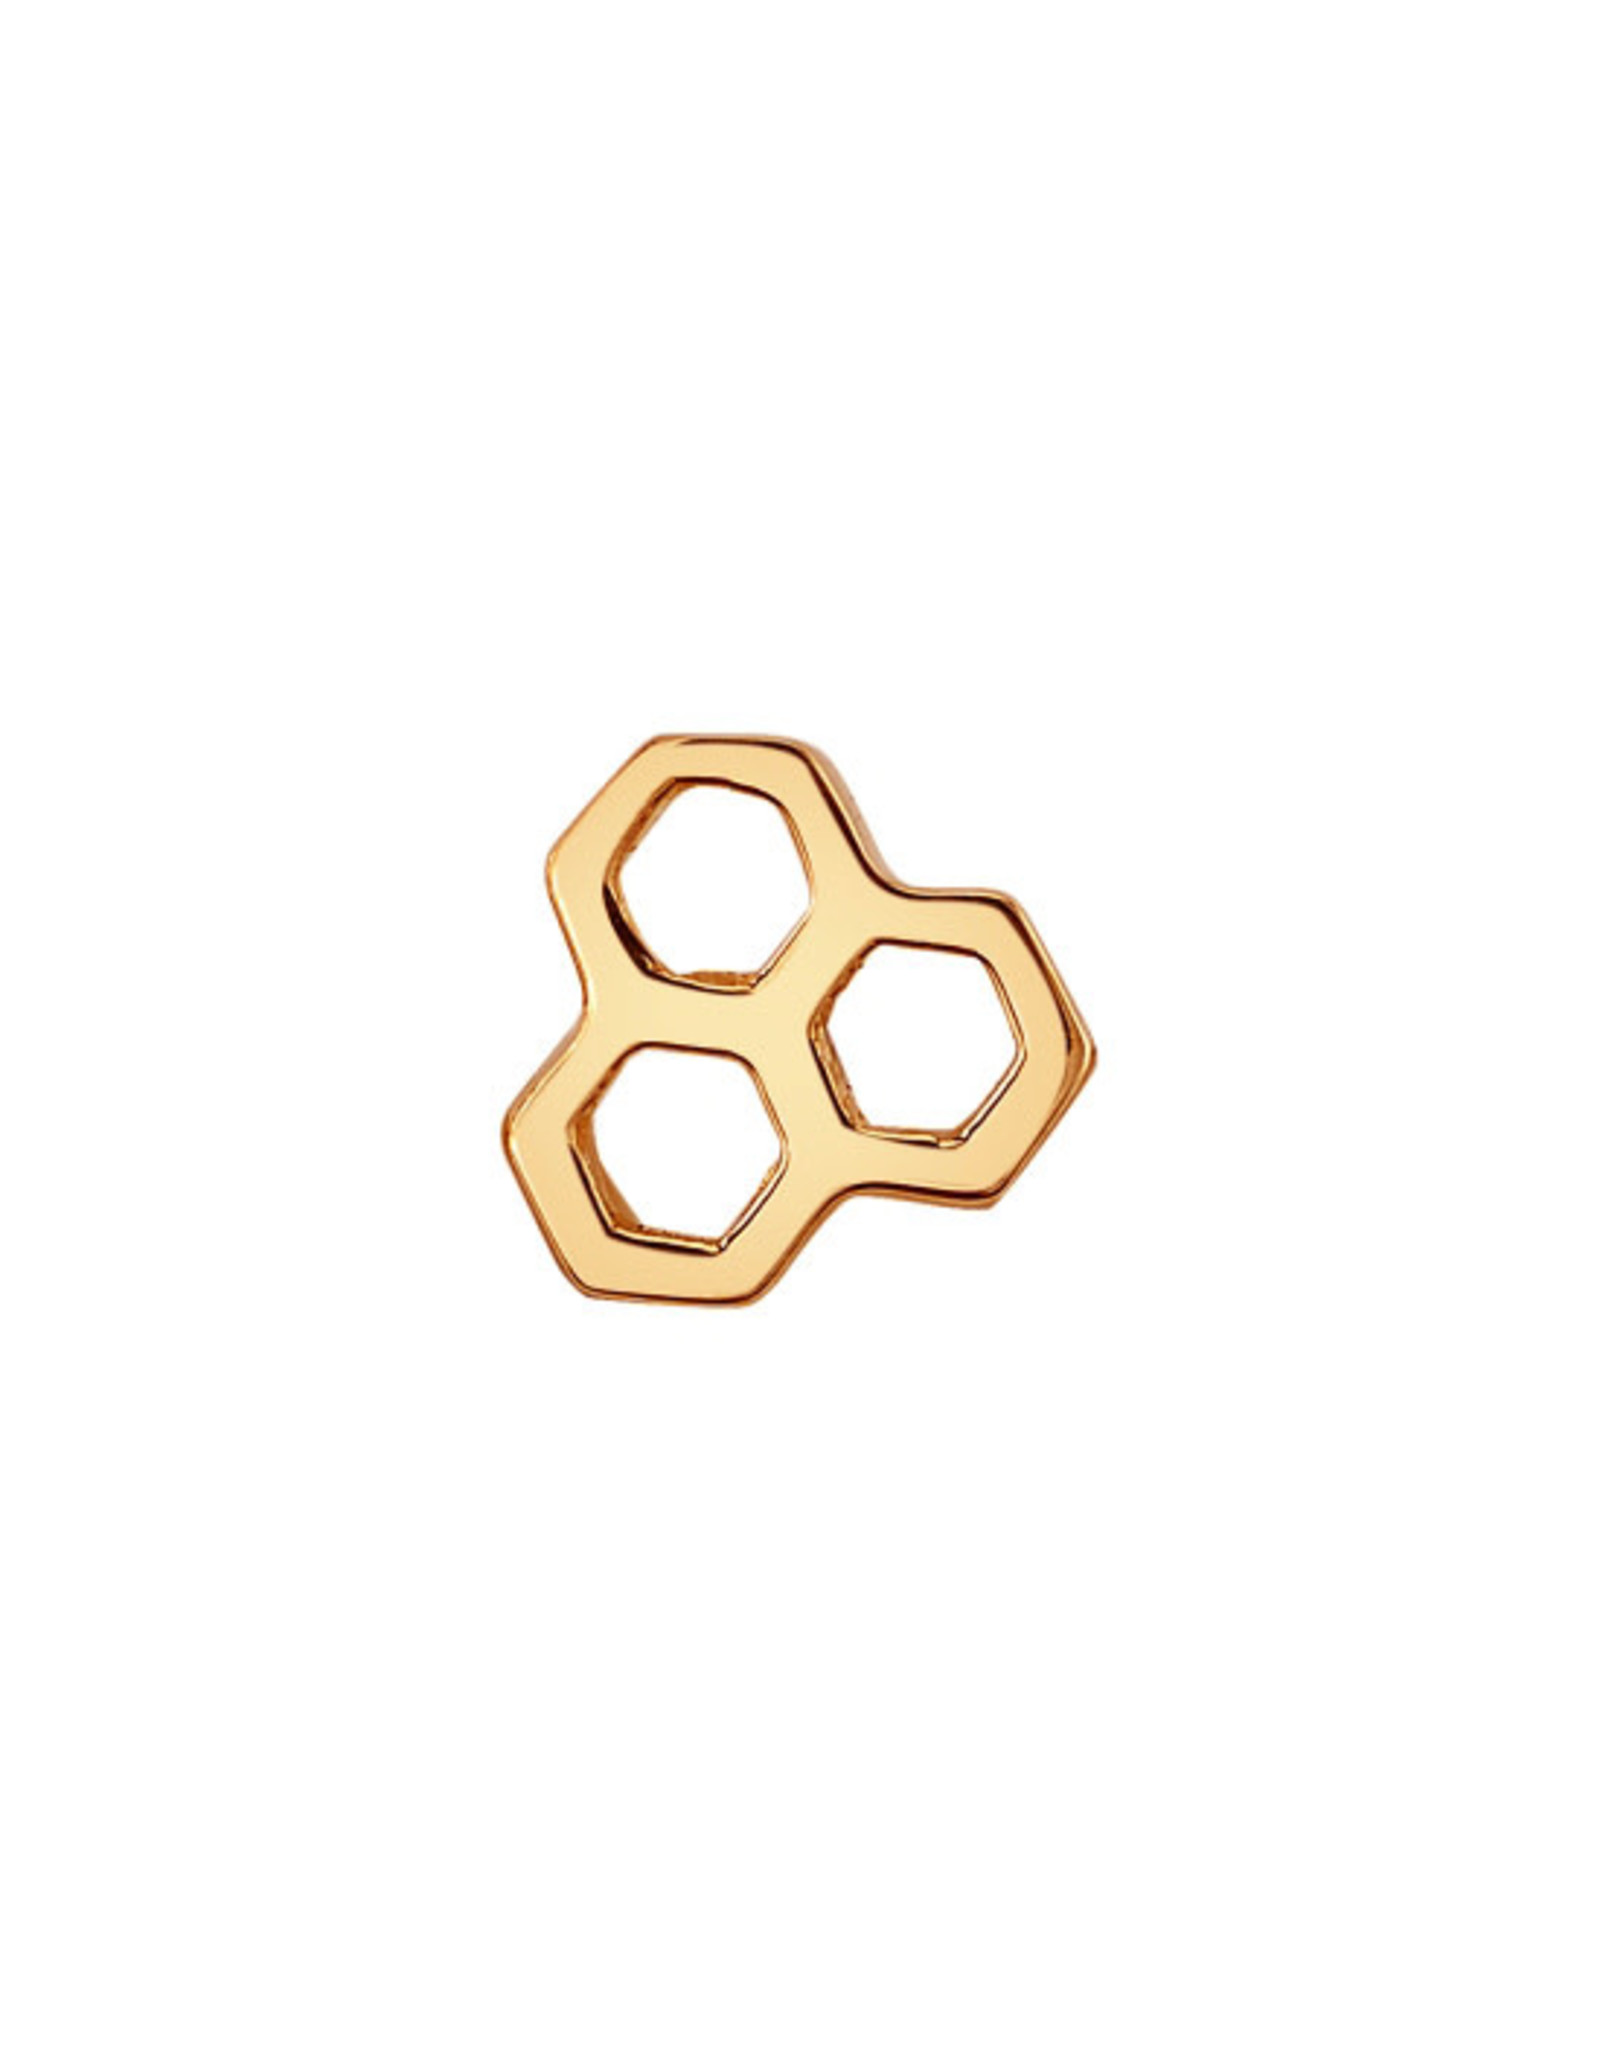 "BVLA BVLA ""Rayon"" honeycomb press fit end"